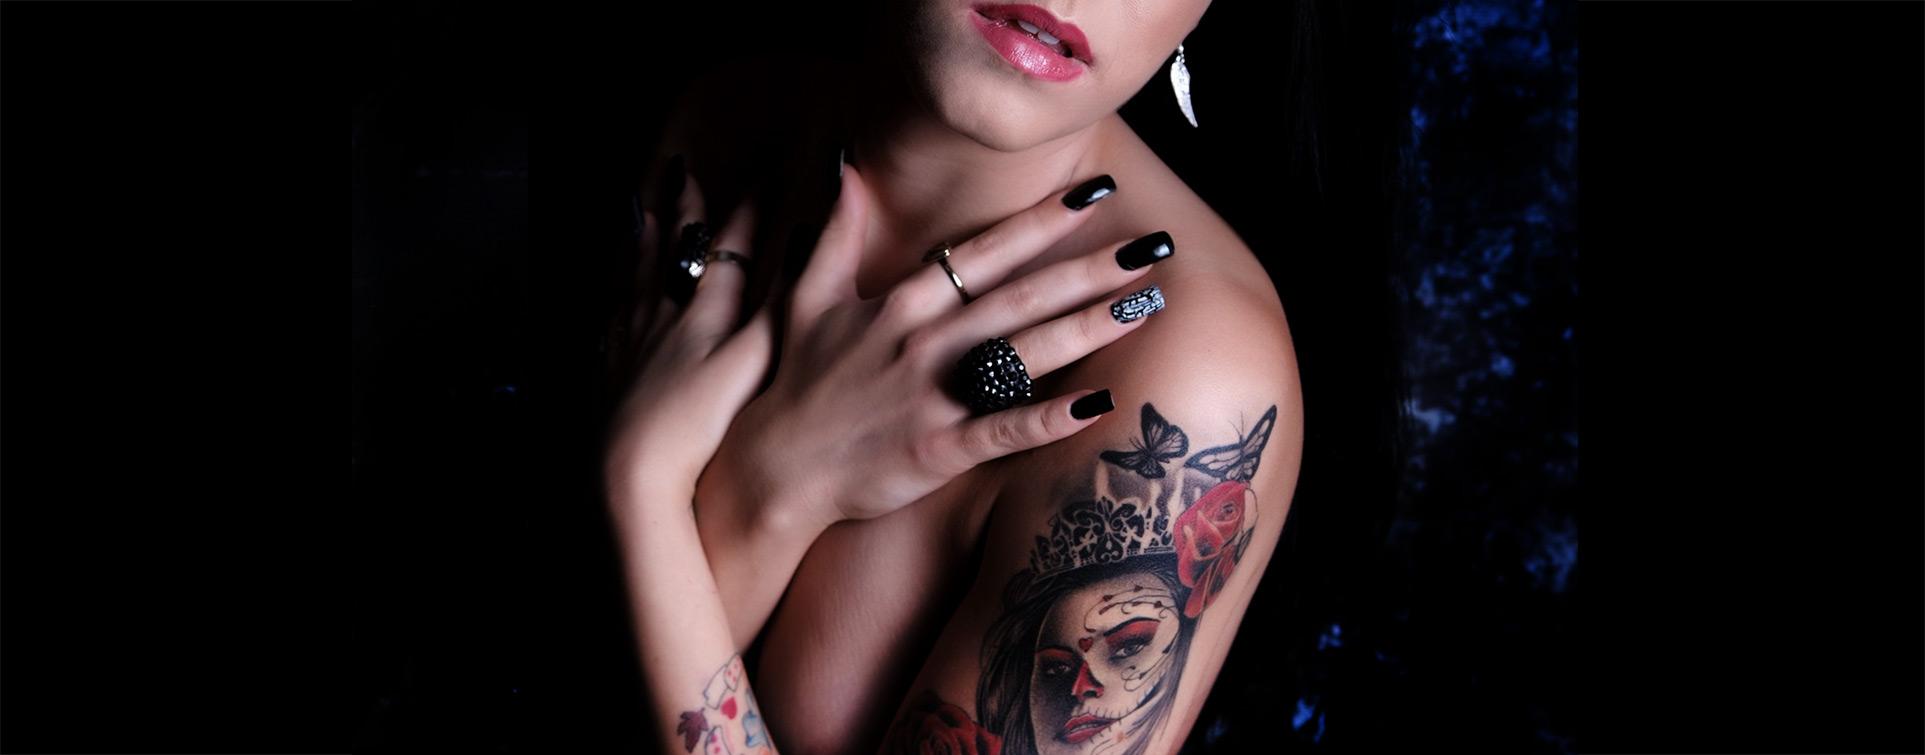 boudoir-photography-tattoo-modeling